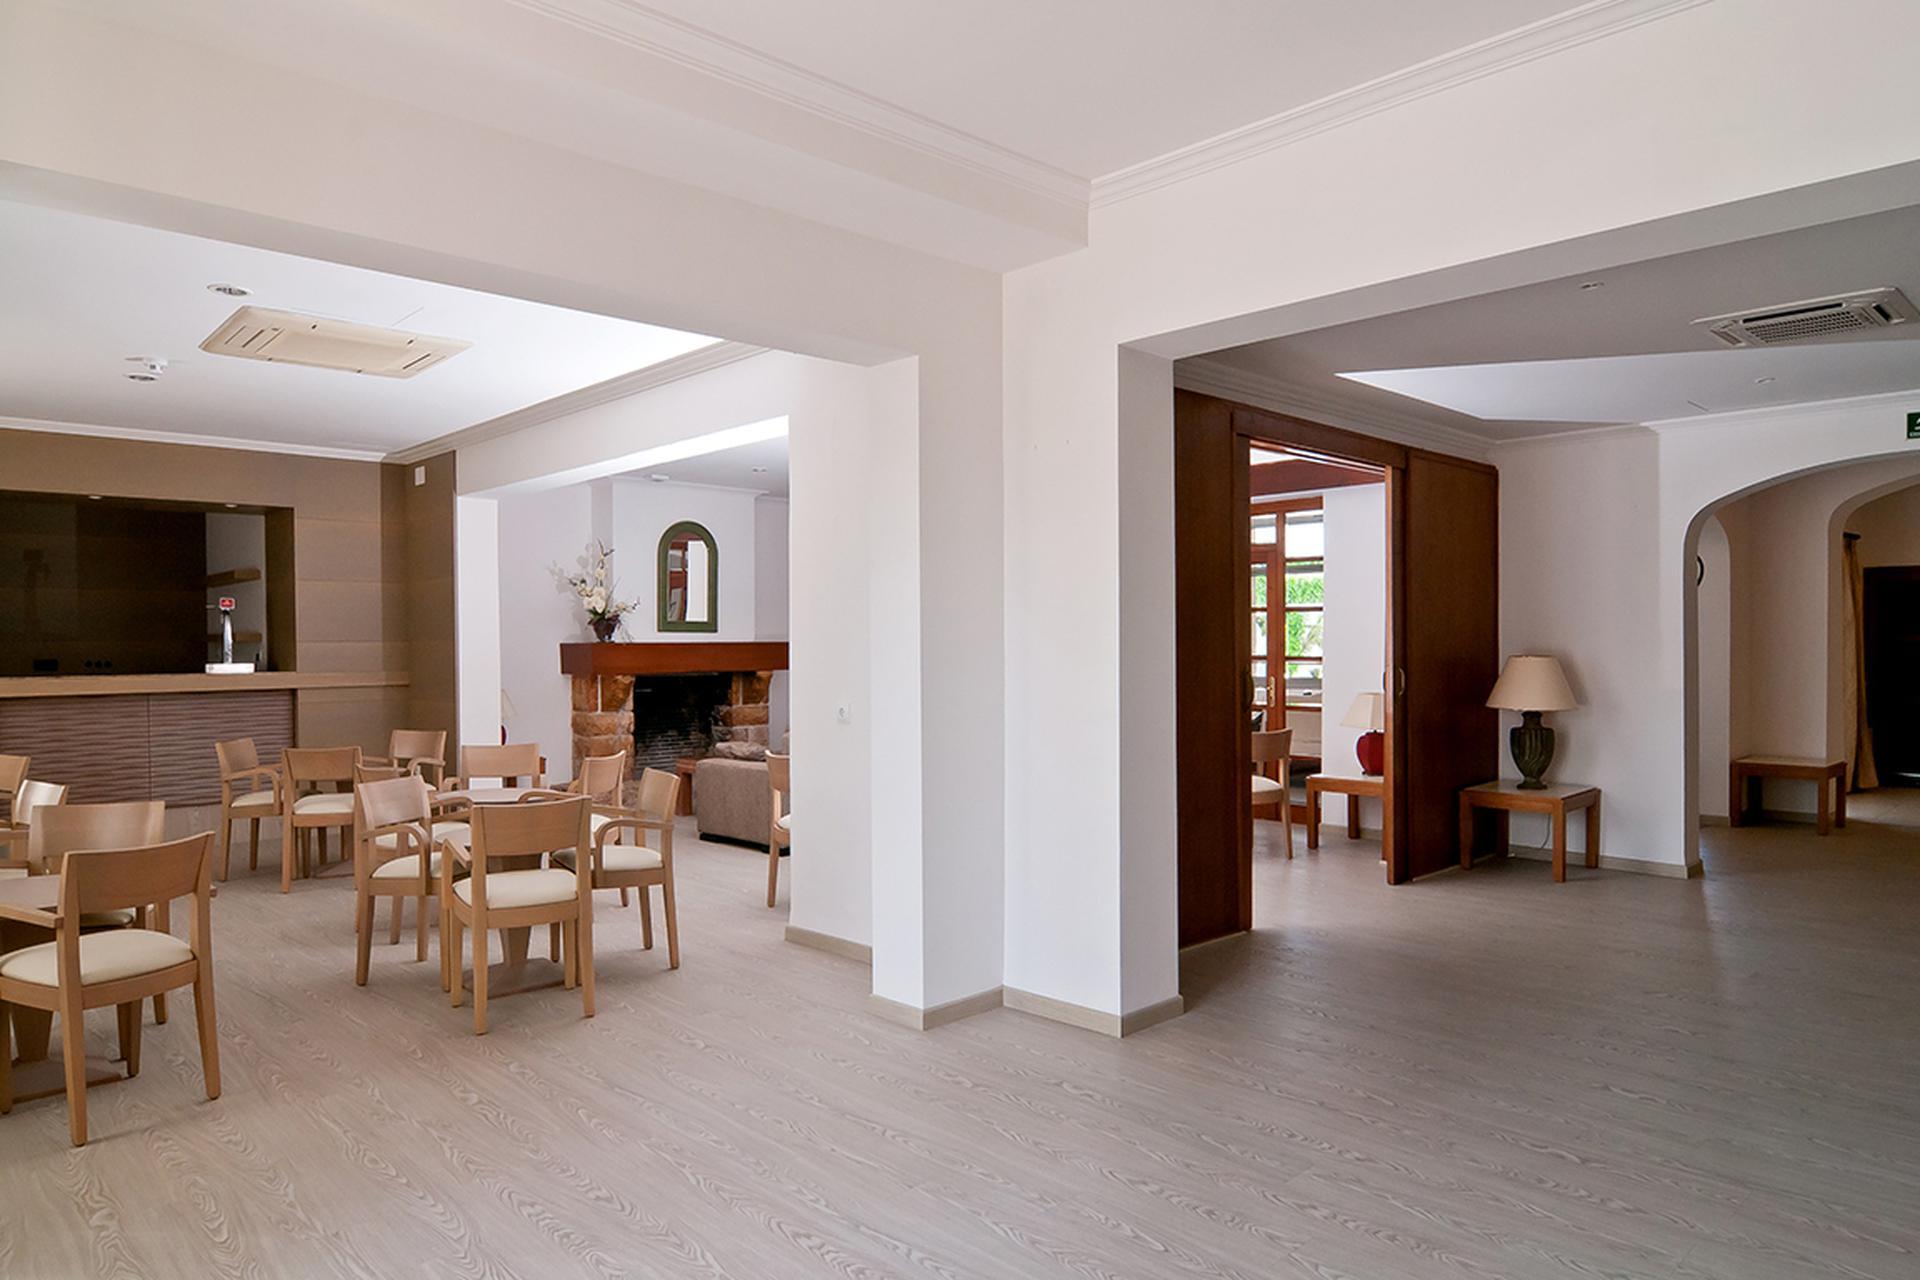 Hotel Eix Alcudia**** in Mallorca, Spanje | Zonvakantie Sunweb - Zonvakanties